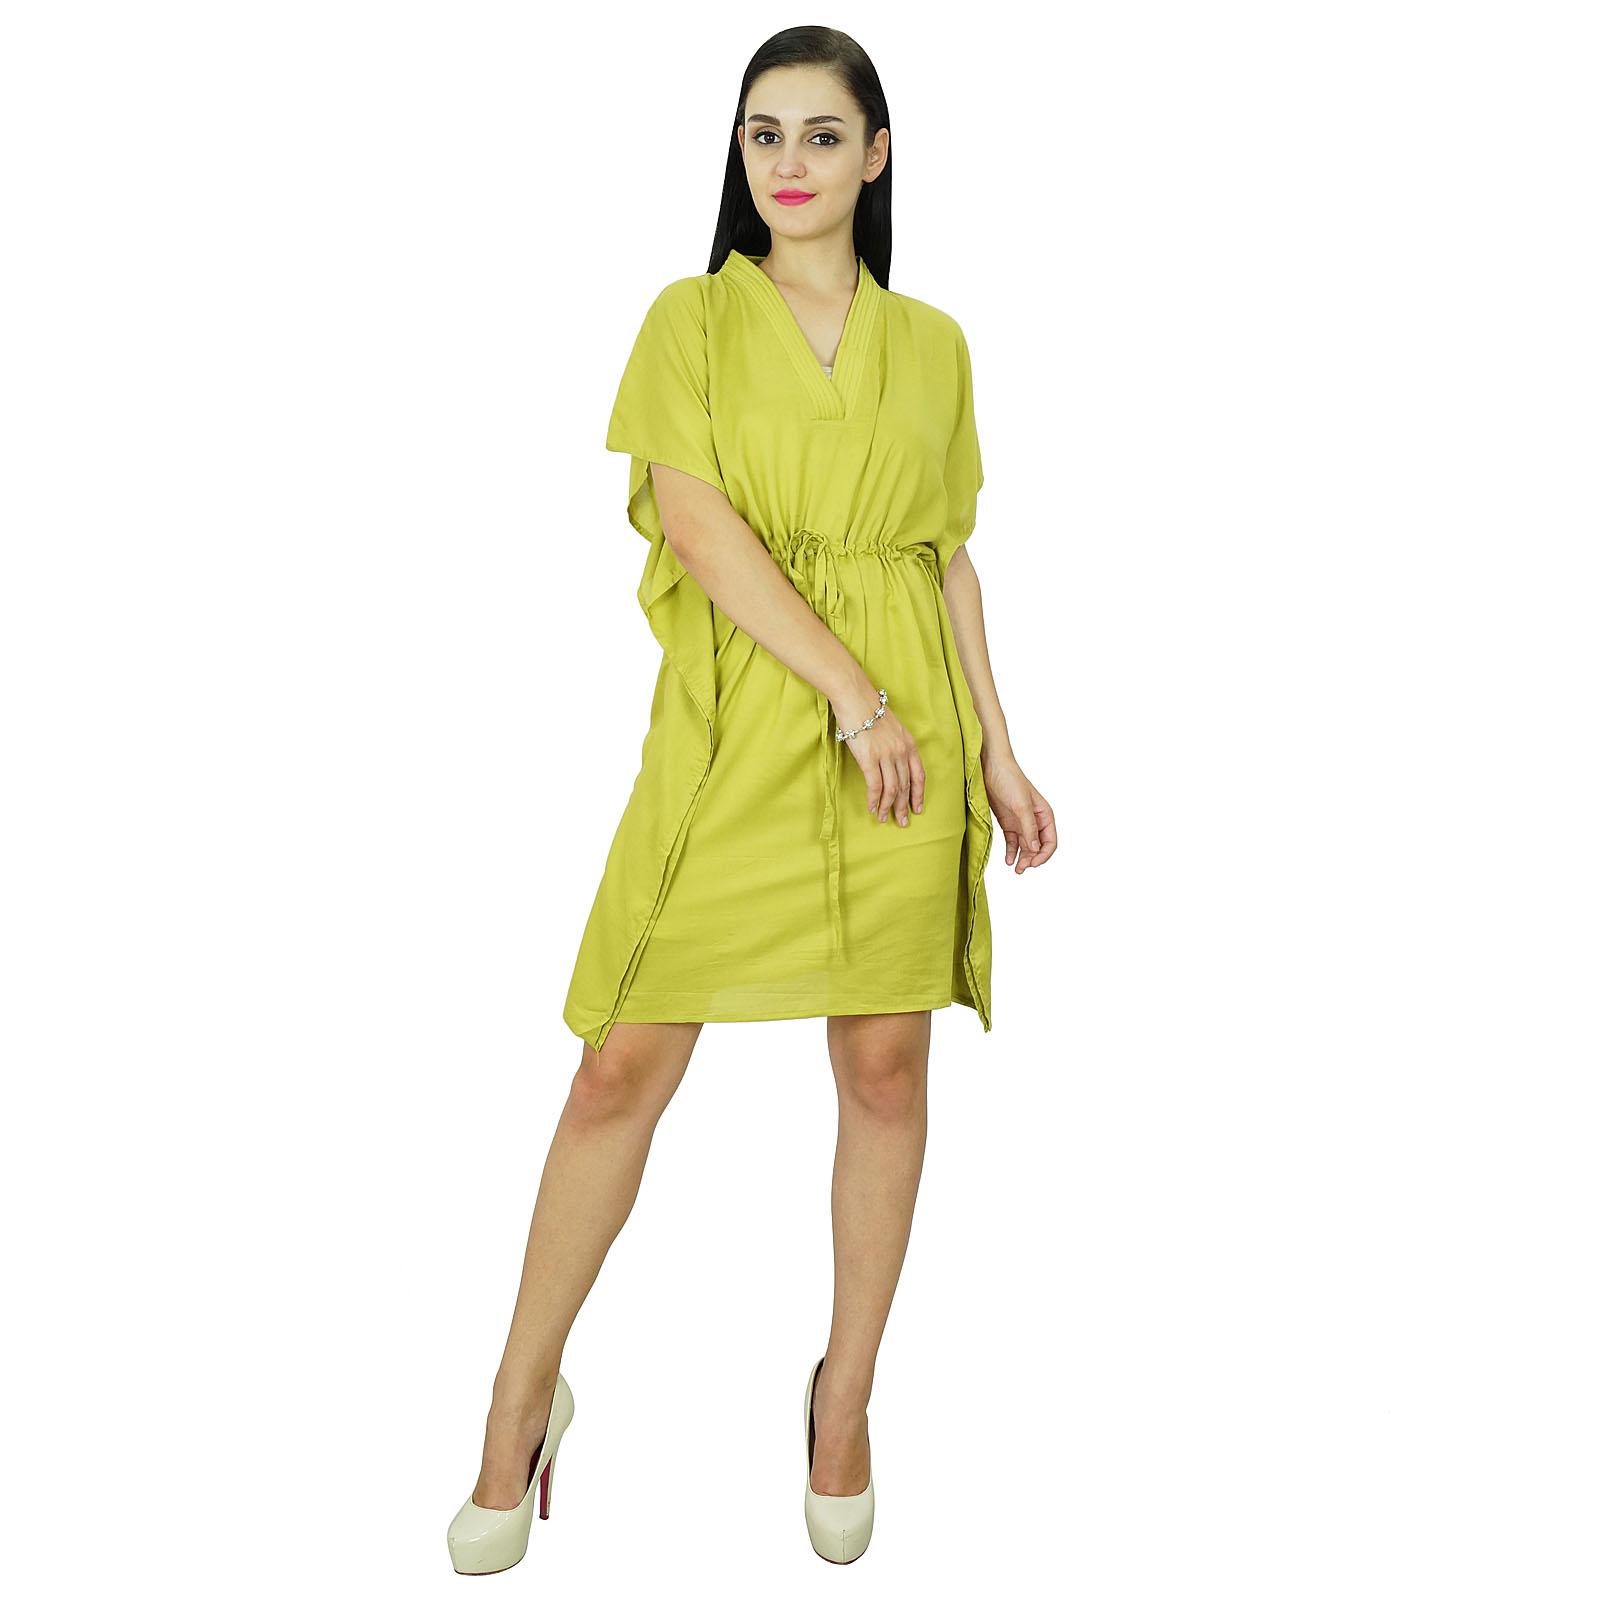 thumbnail 25 - Bimba Women Plain Kaftan Dress Beach Cover Up Cotton Solid Caftan-58z